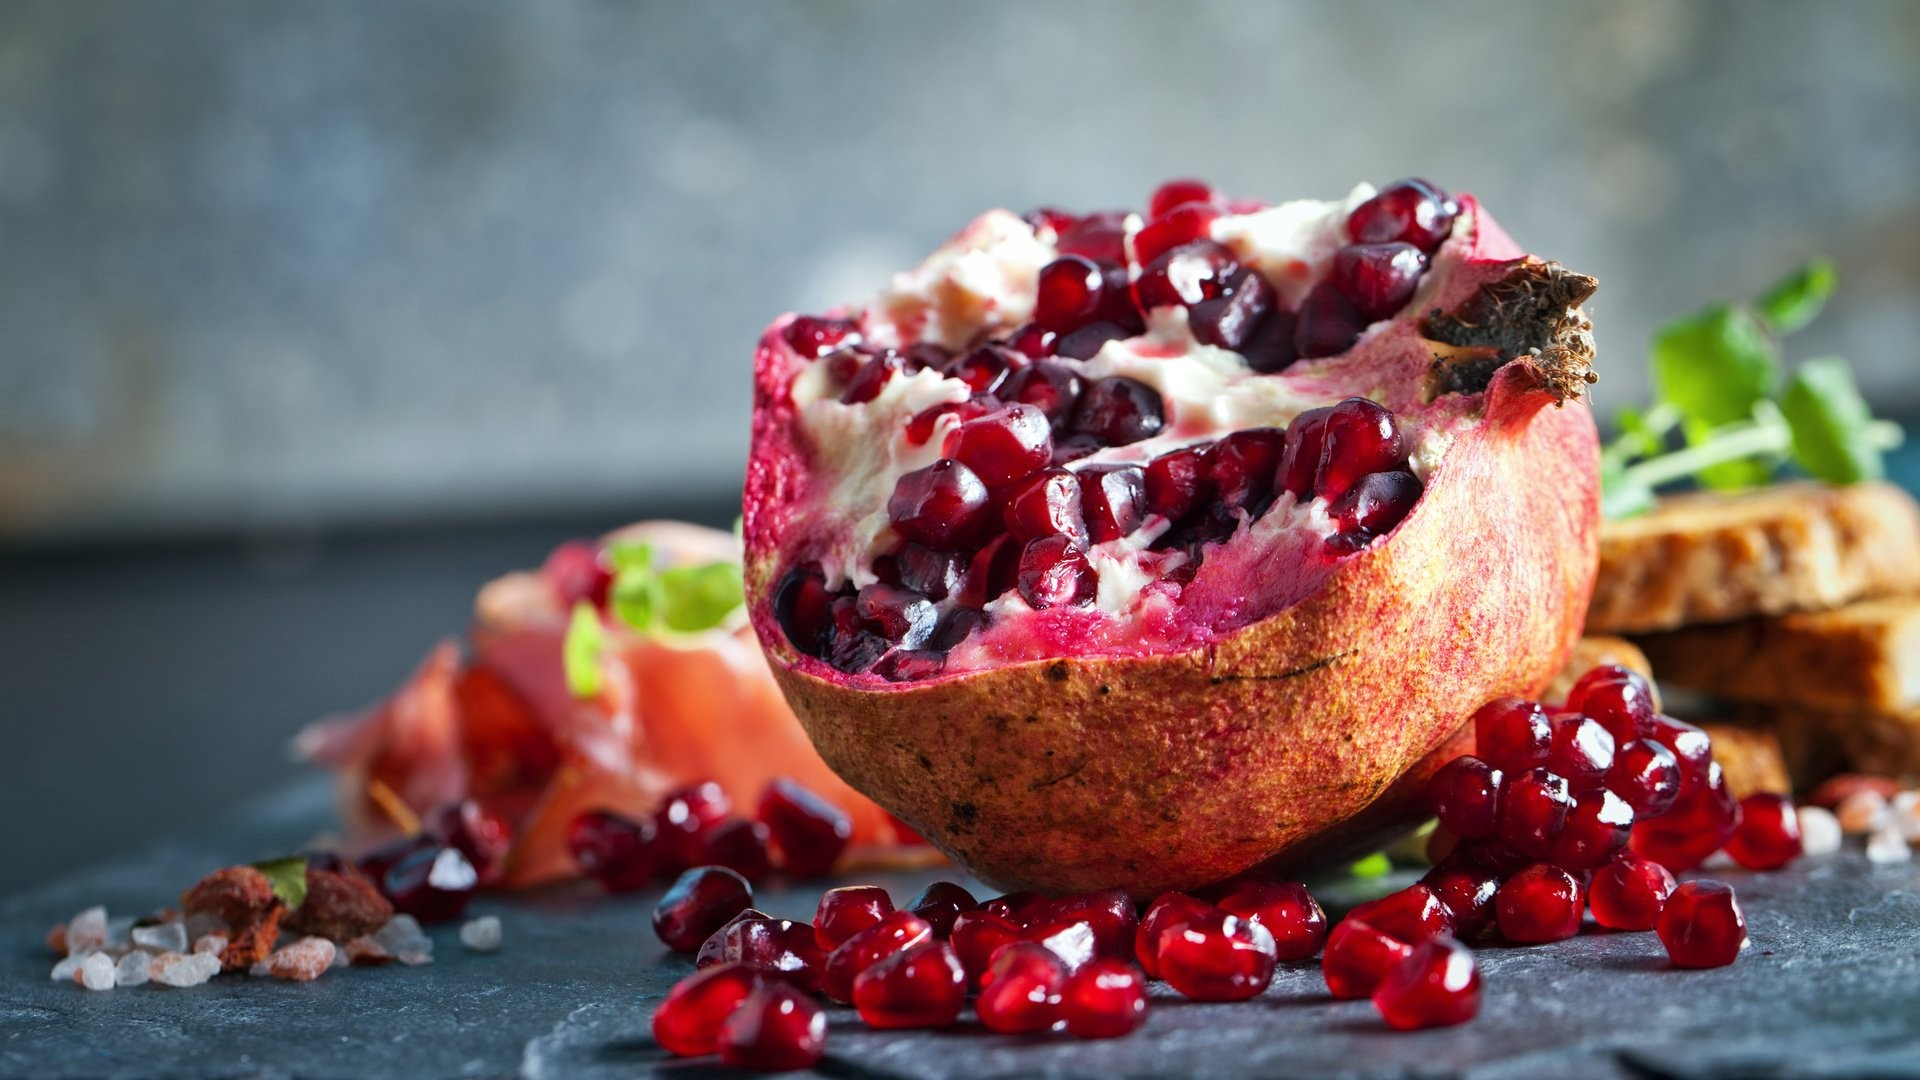 Pomegranate hd wallpaper download